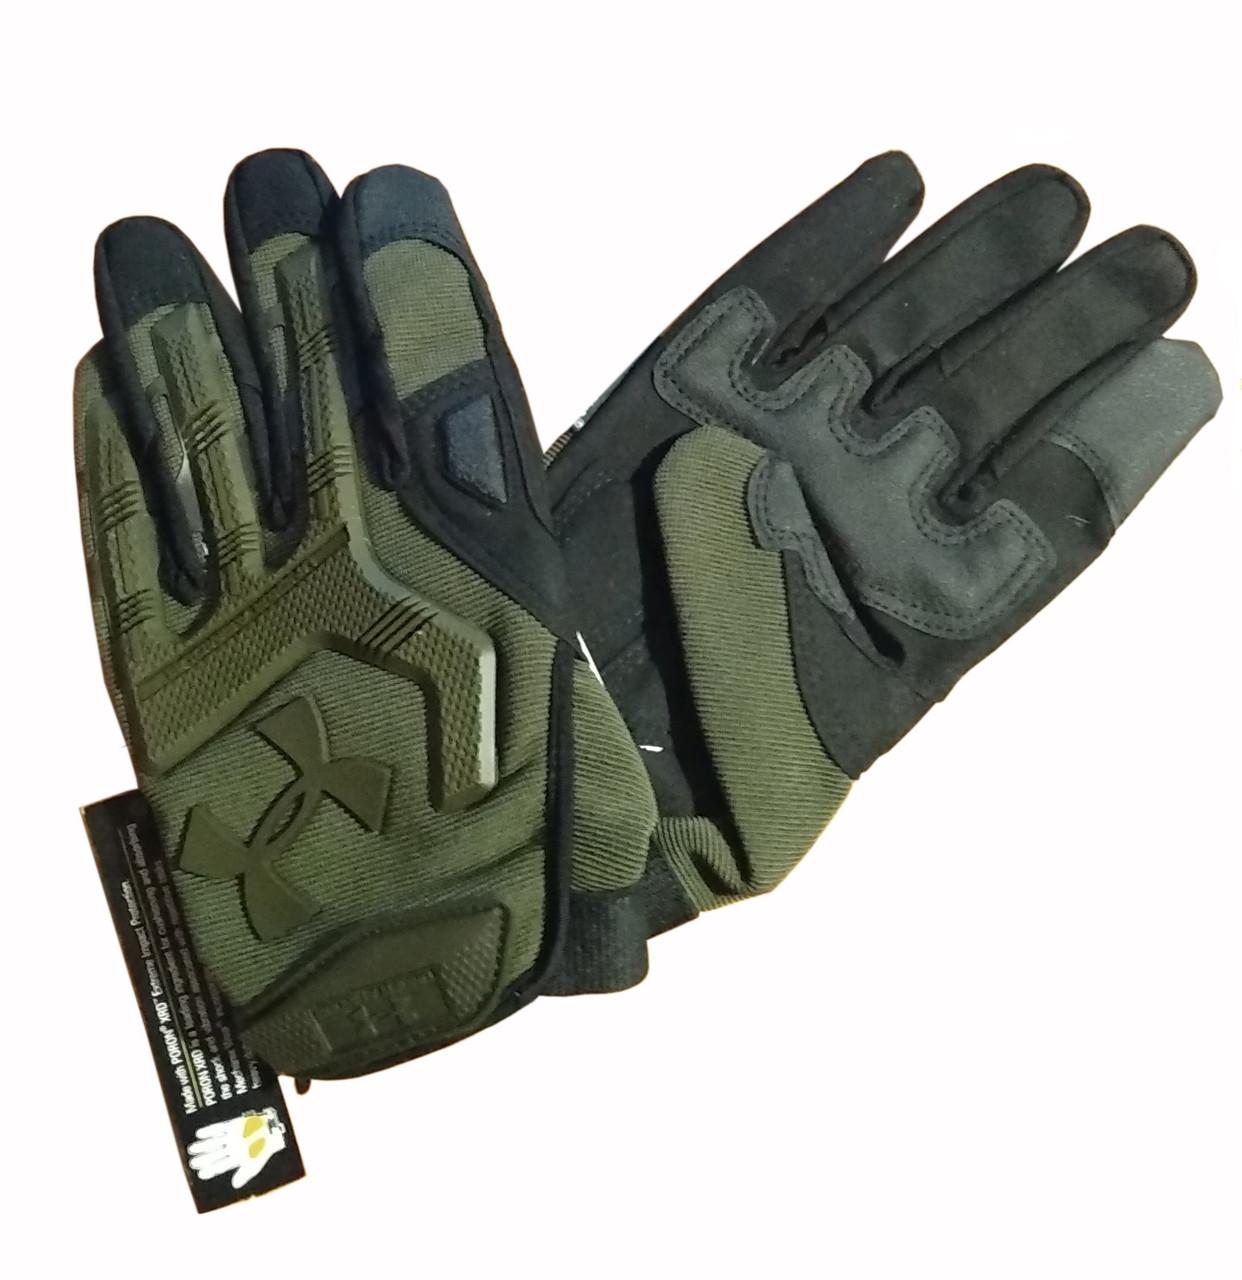 Перчатки тактические армейского образца нато (олива)